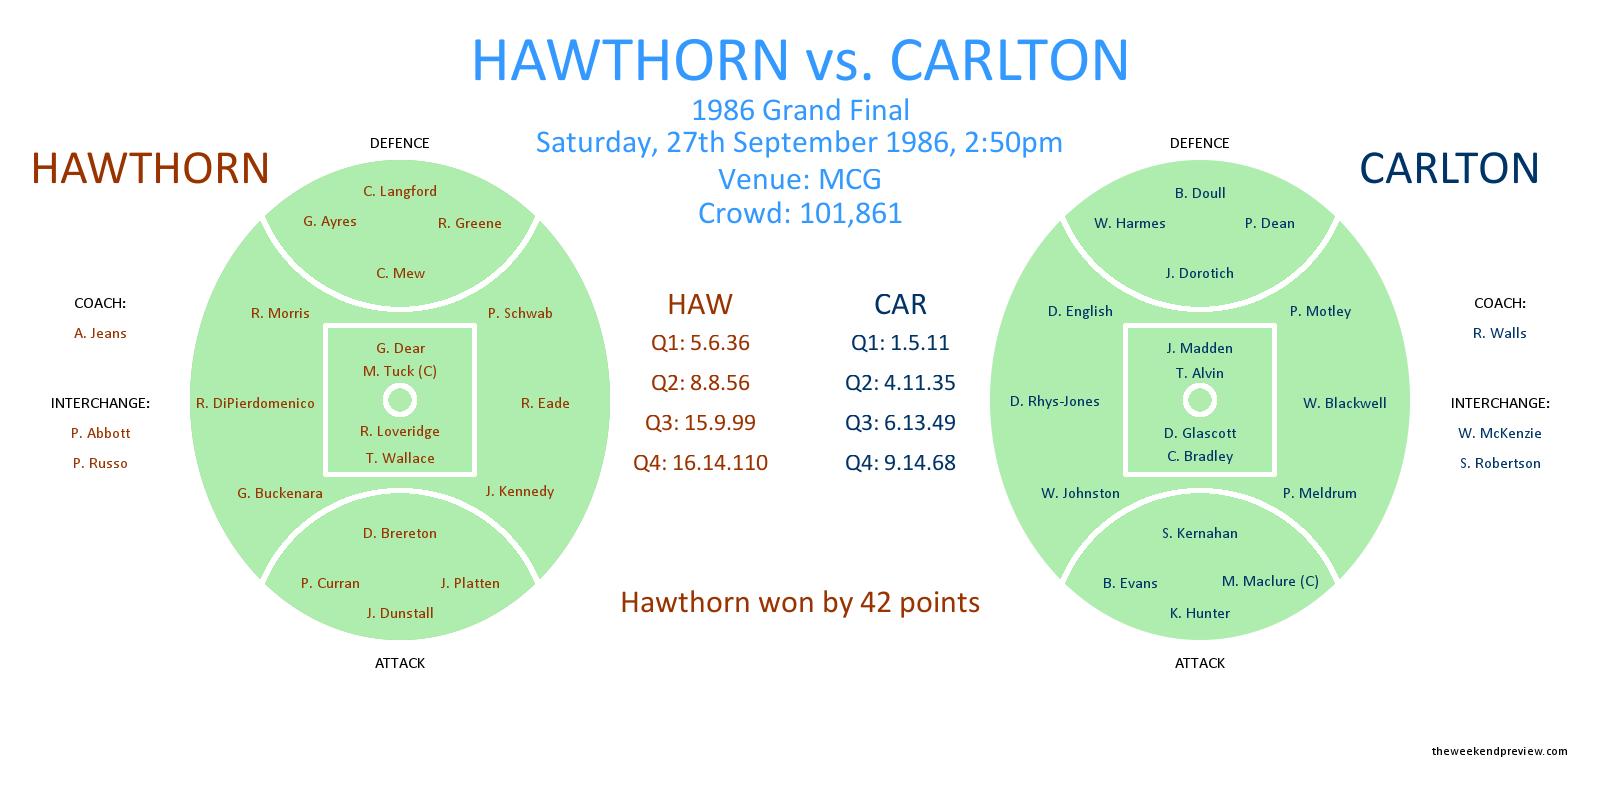 Figure-1: Hawthorn versus Carlton, 1986 Grand Final